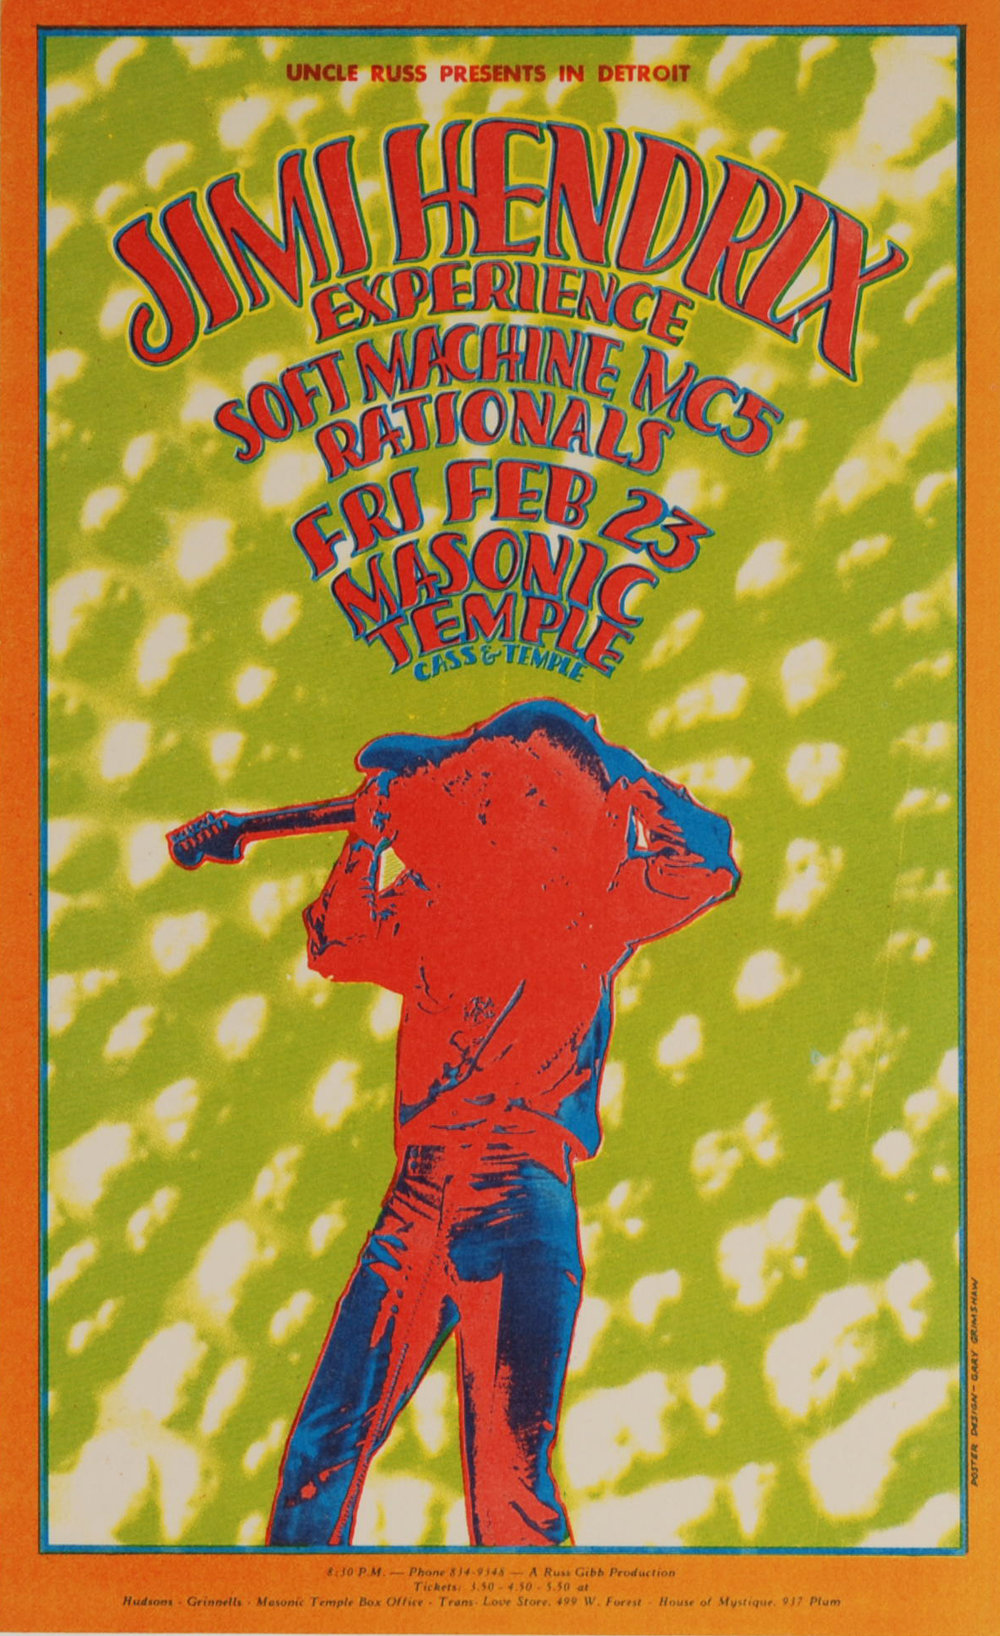 31_2_23_68Masonic Temple - Jimi Hendrix Eperience (Handbill).jpg